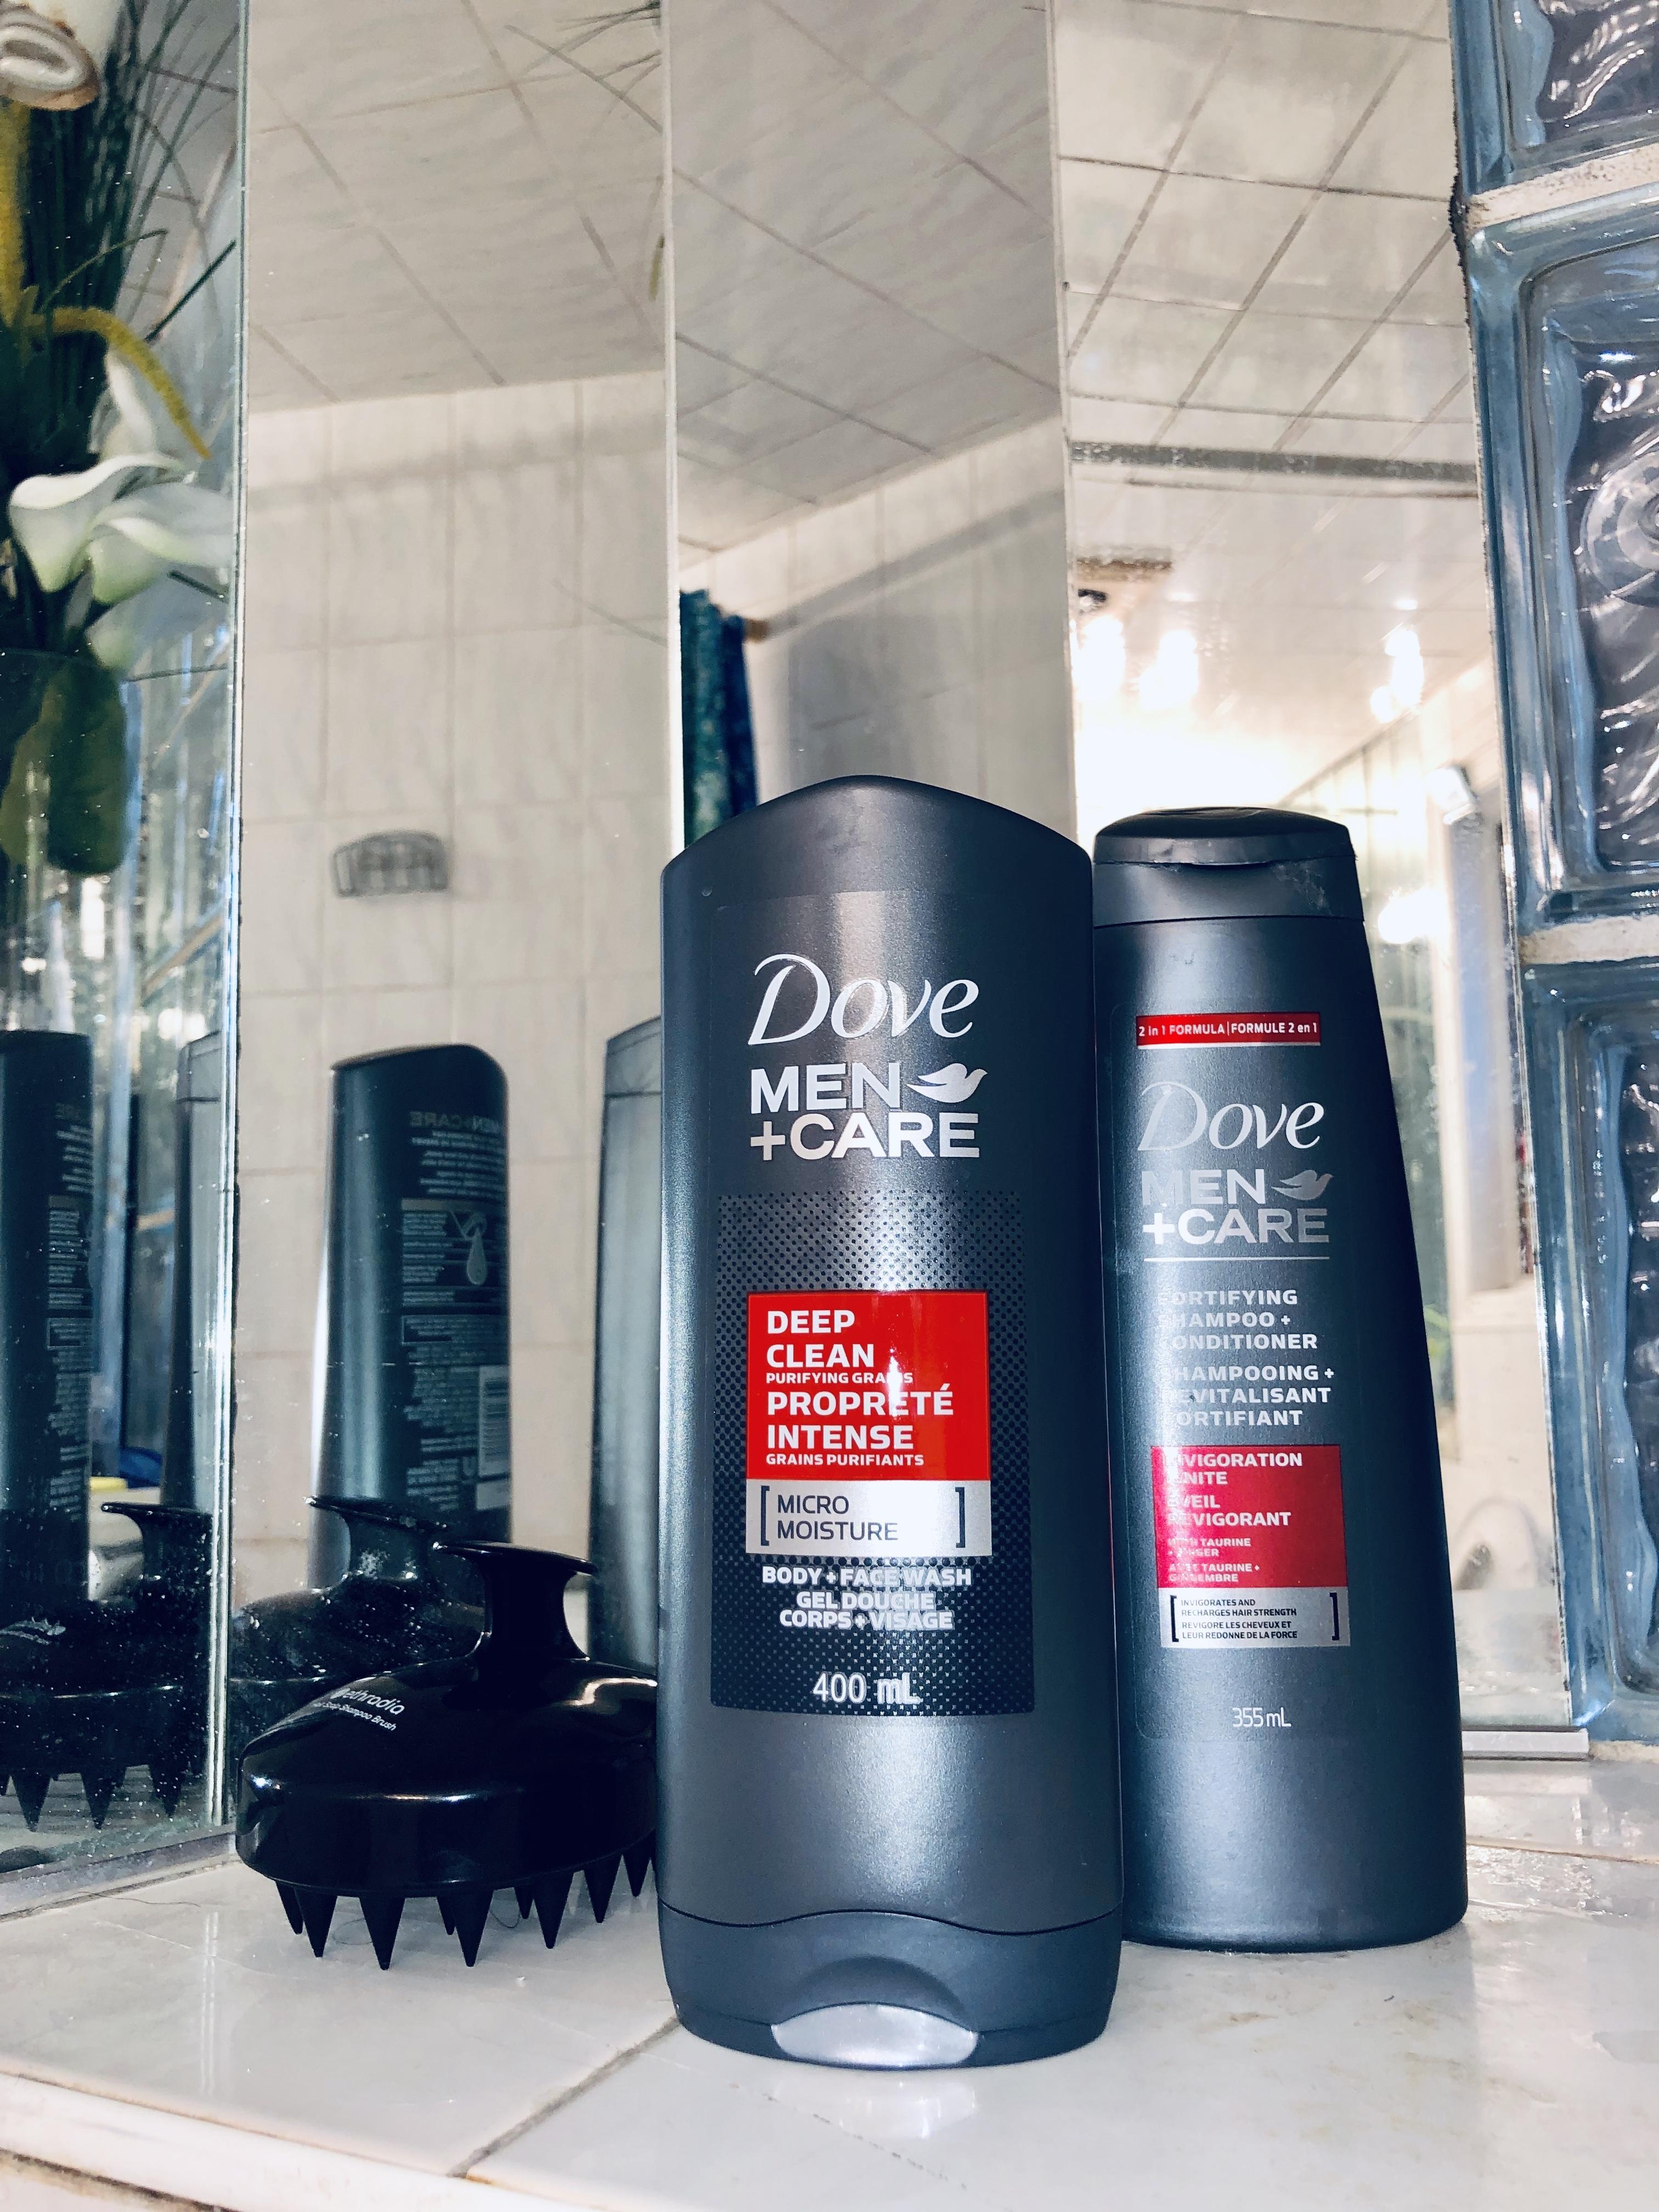 Dove Men Care Deep Clean Micro Moisture Body Face Wash Reviews In Men S Body Wash Chickadvisor